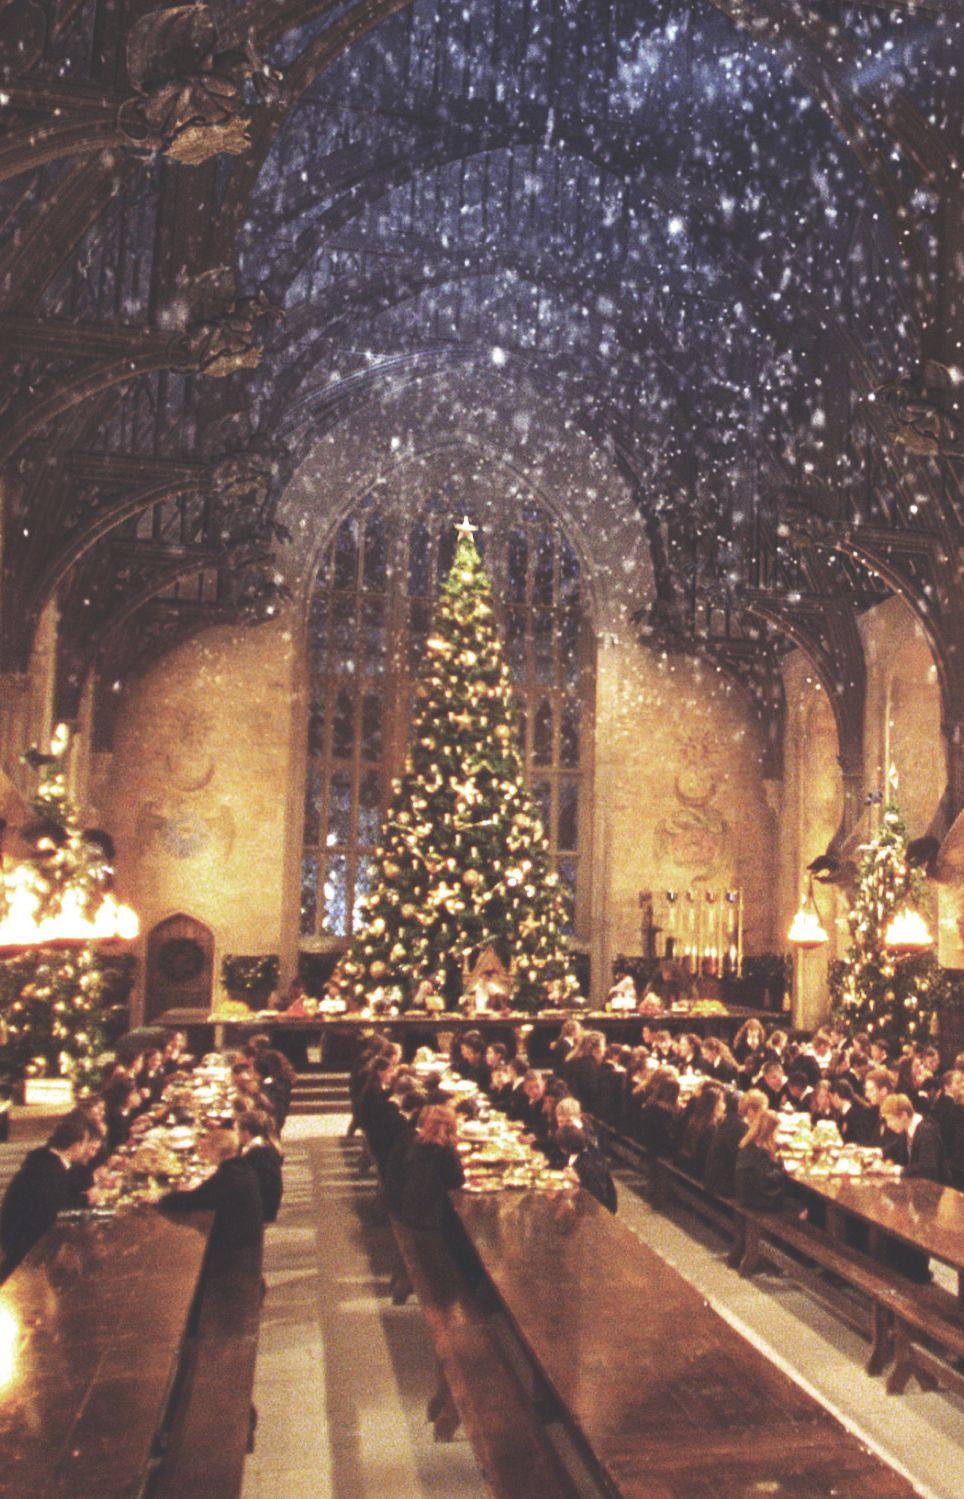 Hogwarts Christmas!